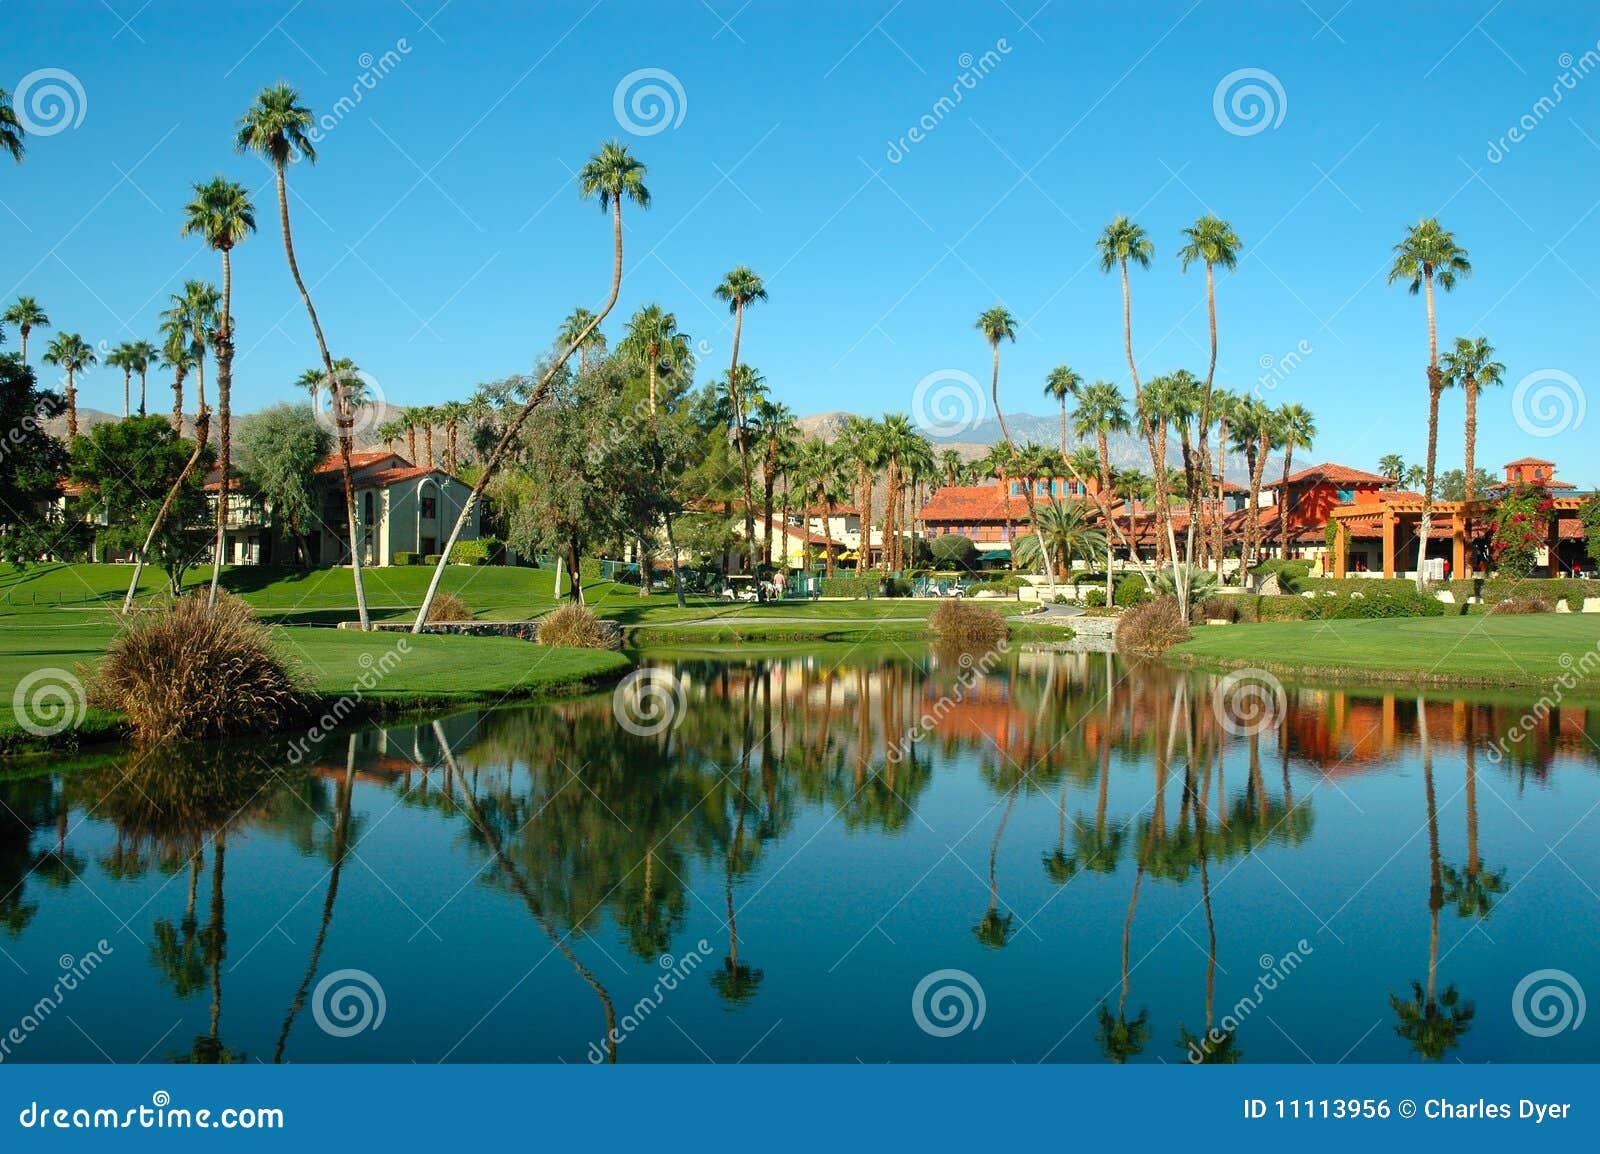 Palm Springs resort